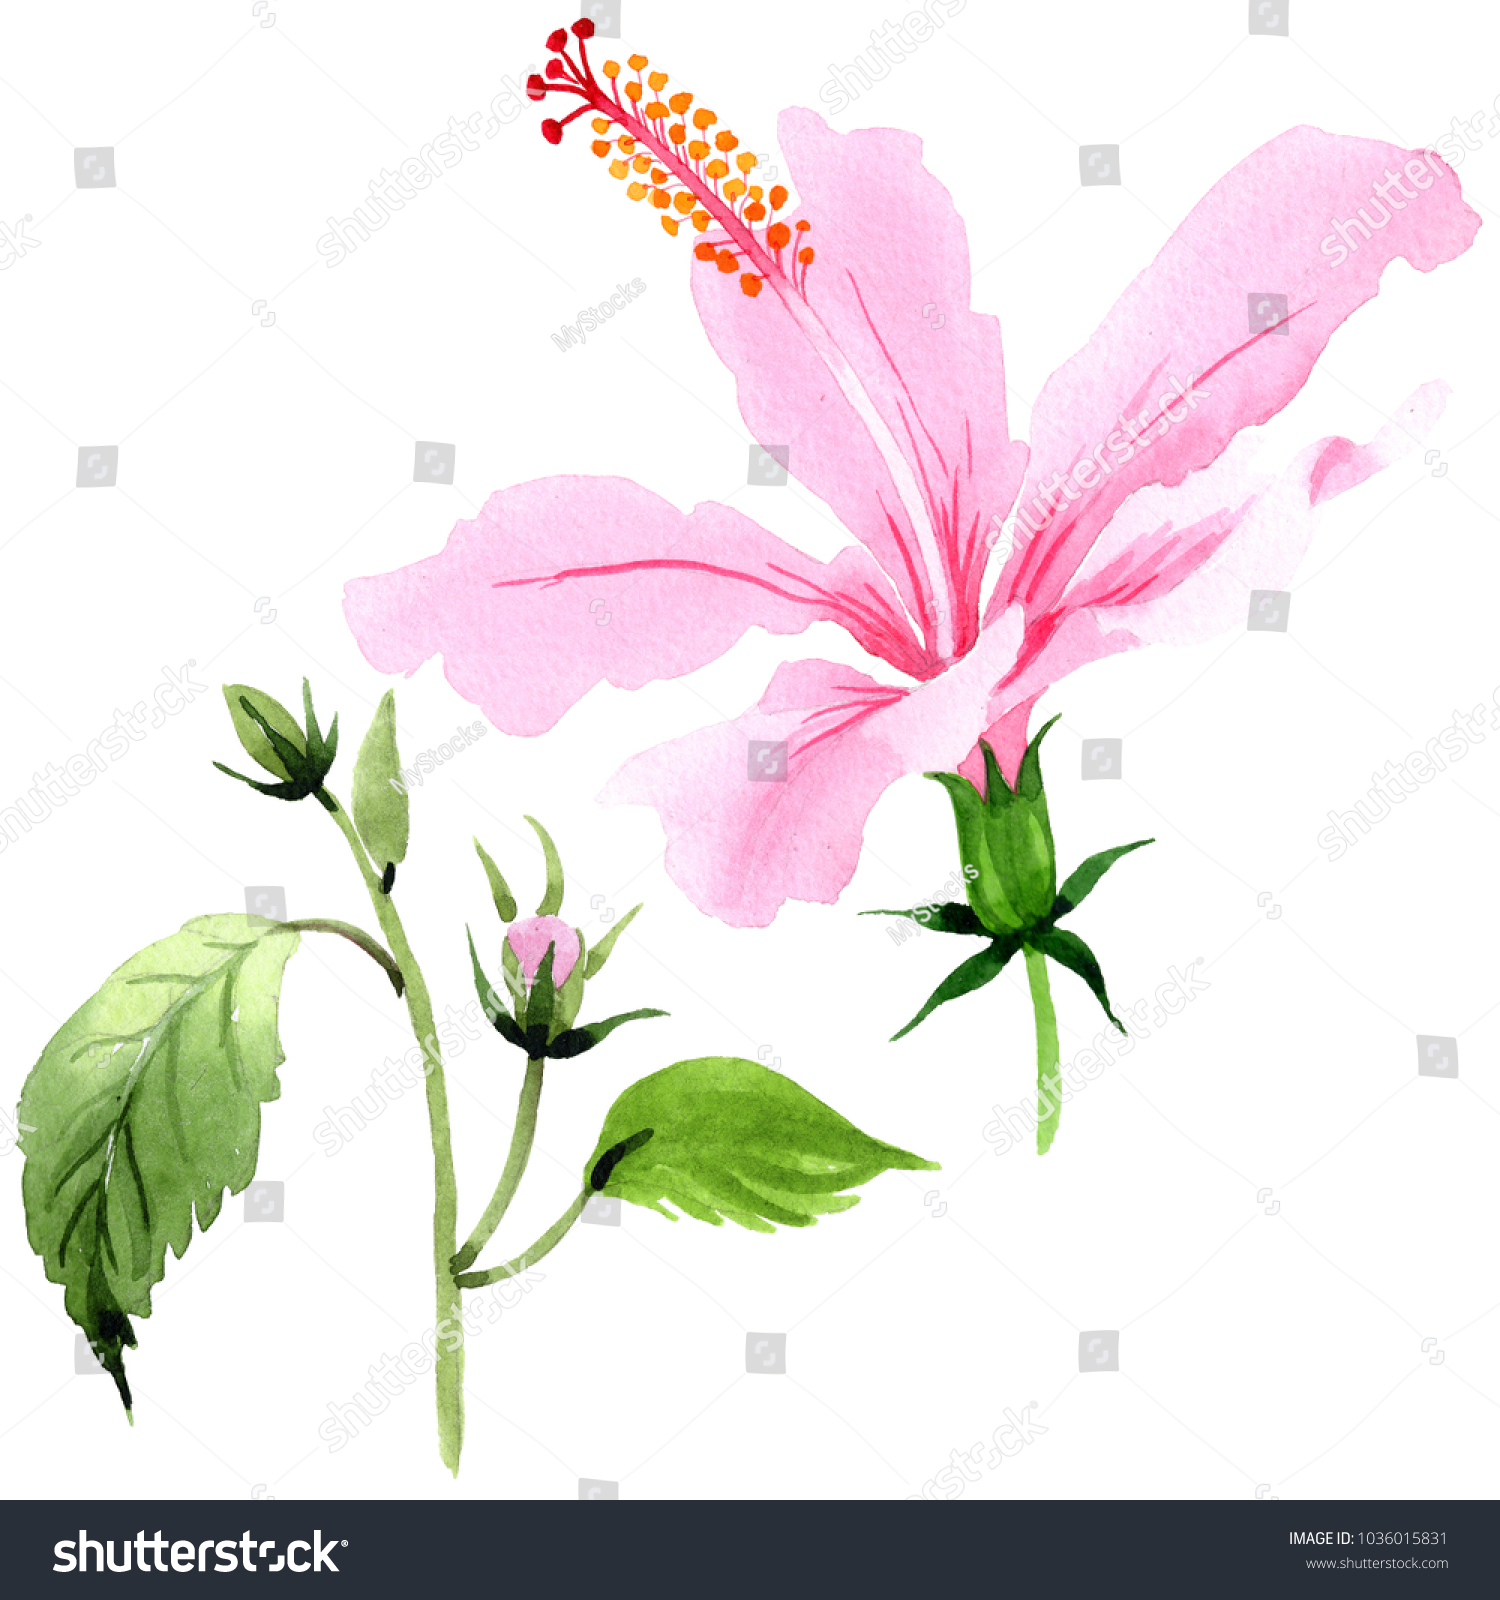 Wildflower hibiscus pink flower watercolor style stock illustration wildflower hibiscus pink flower in a watercolor style isolated full name of the plant izmirmasajfo